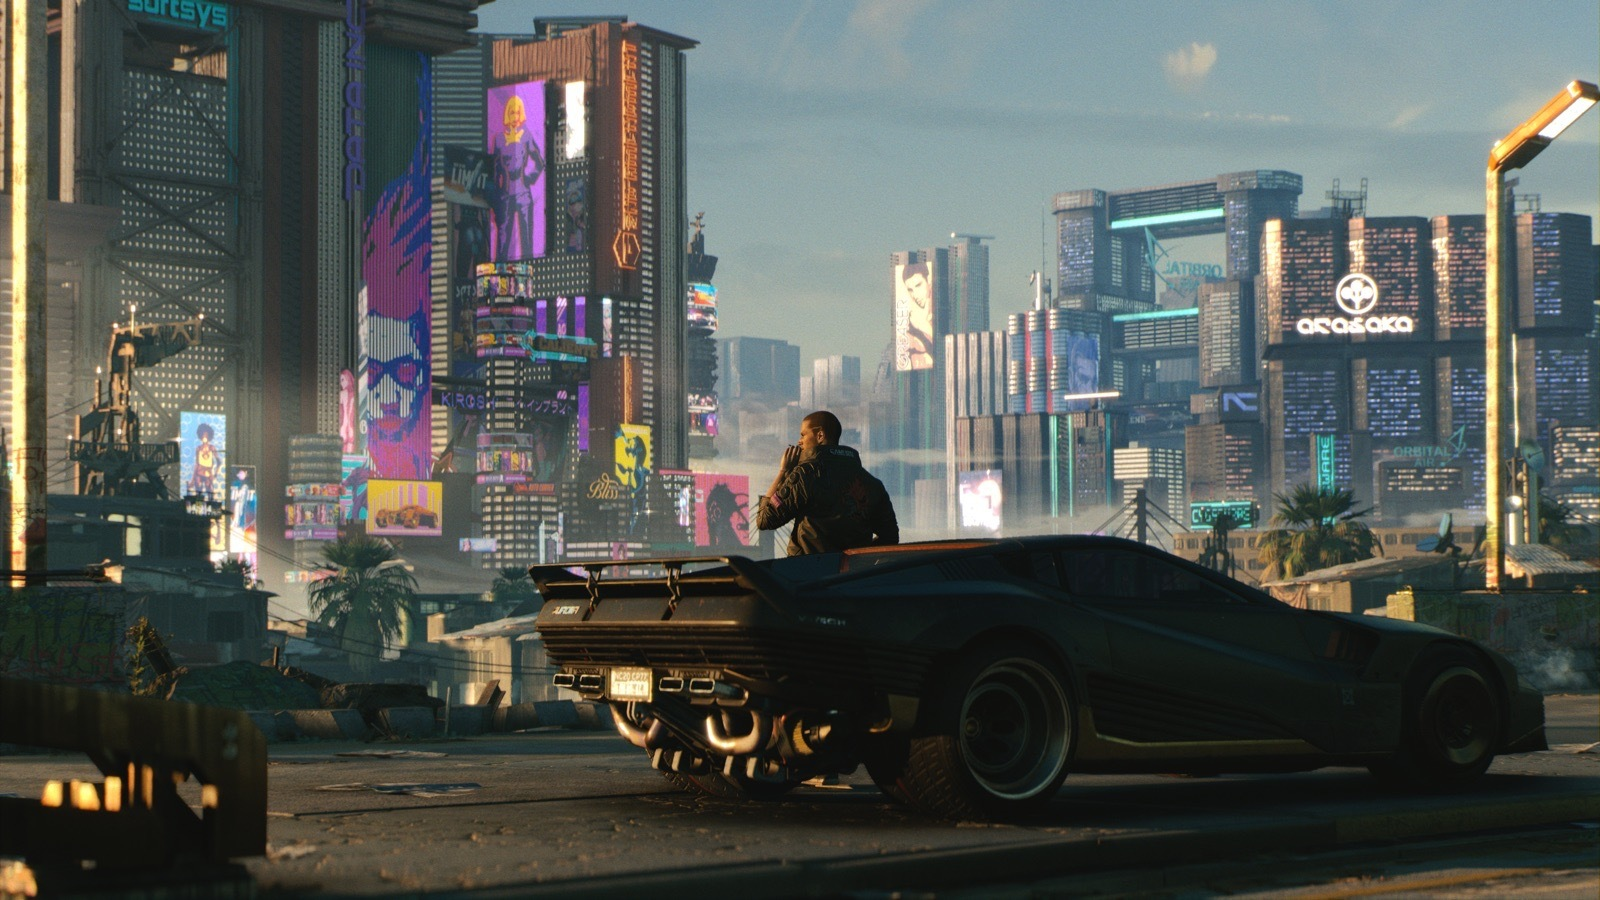 Bloomberg: 'Cyberpunk 2077' full development didn't start until 2016 – Yahoo News Australia